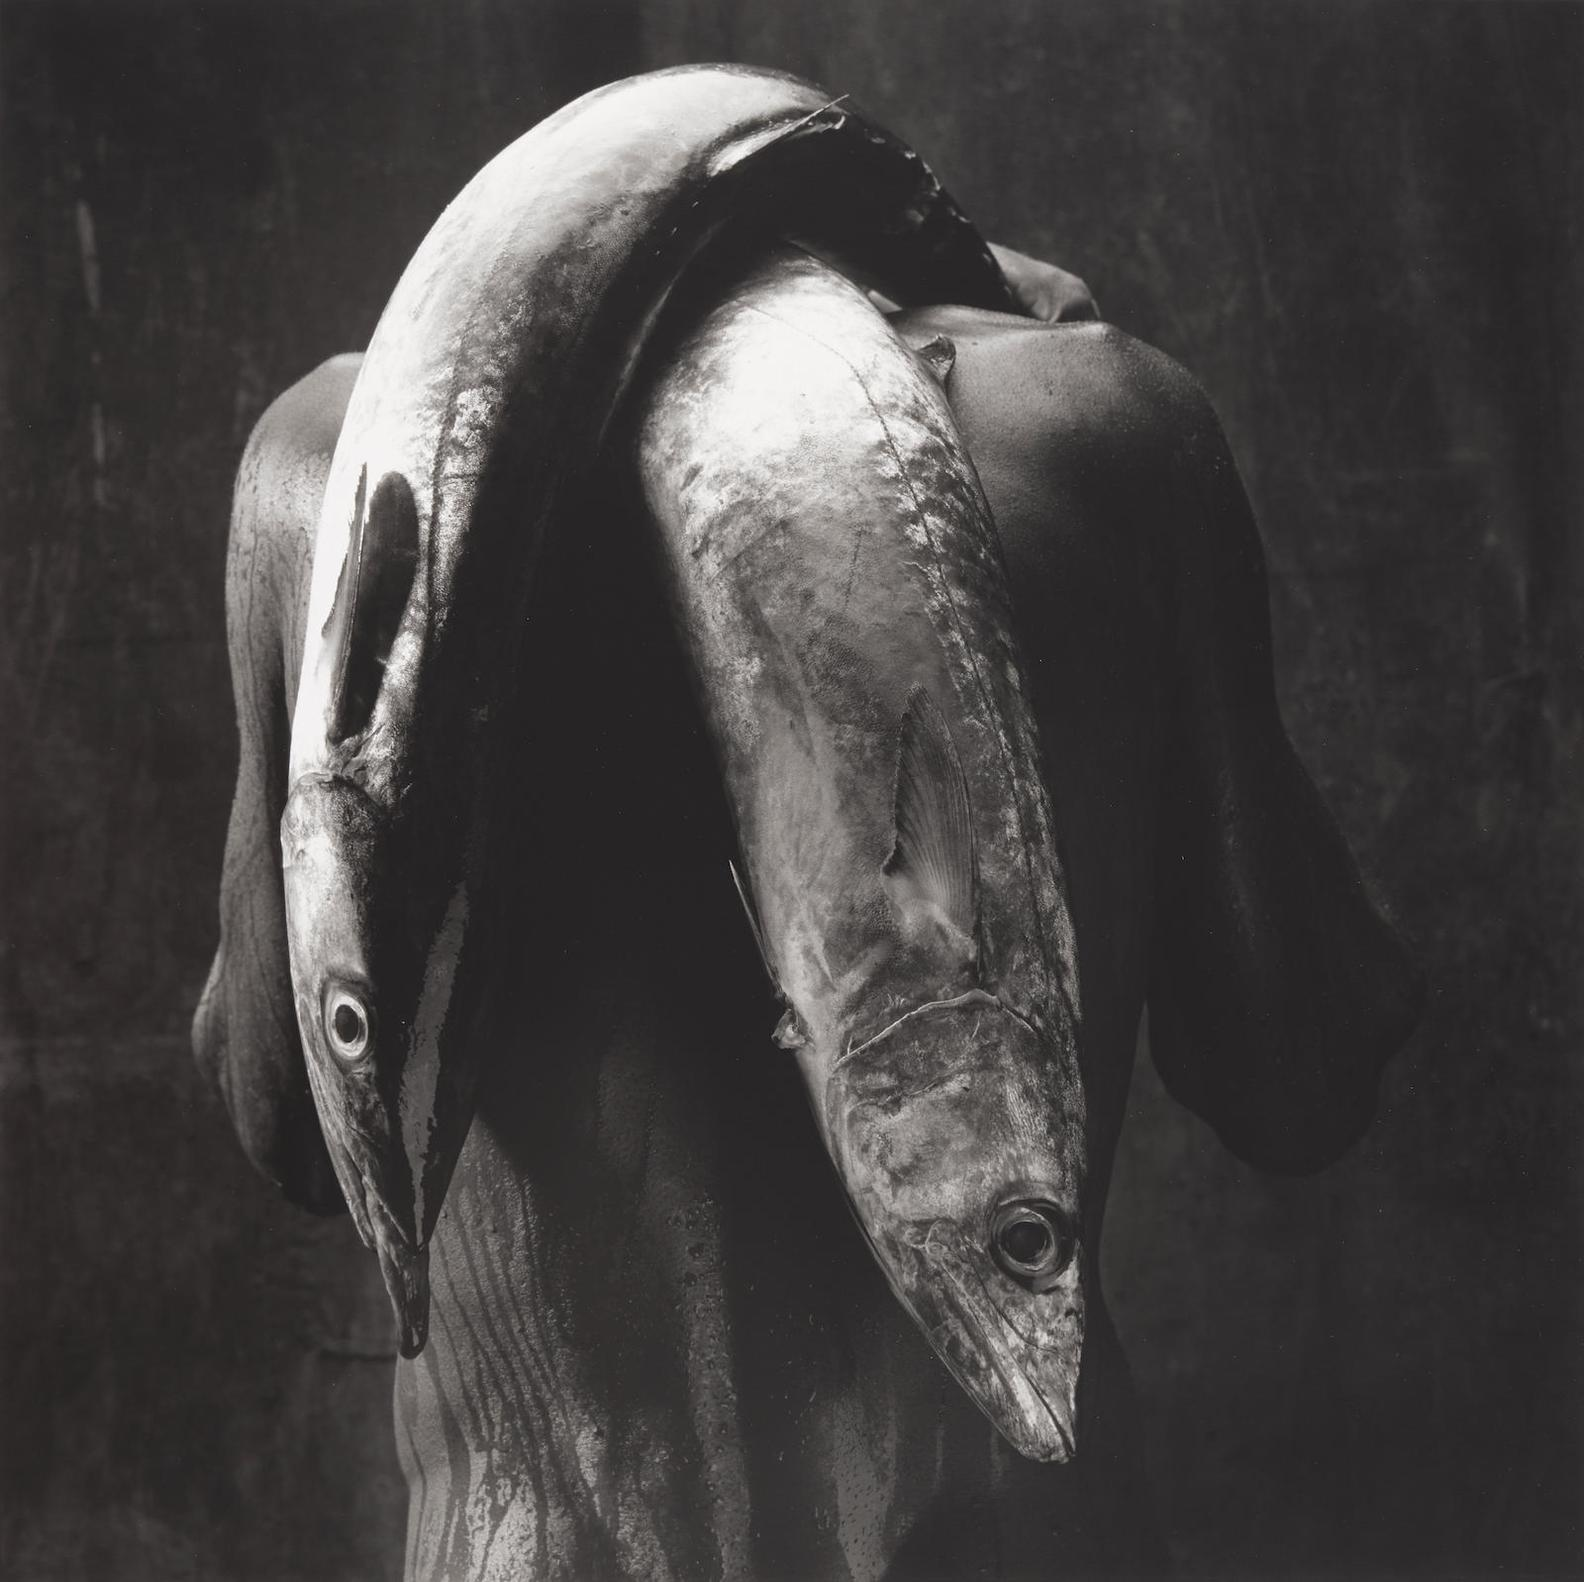 Mario Cravo Neto-Man With Two Fish-1992